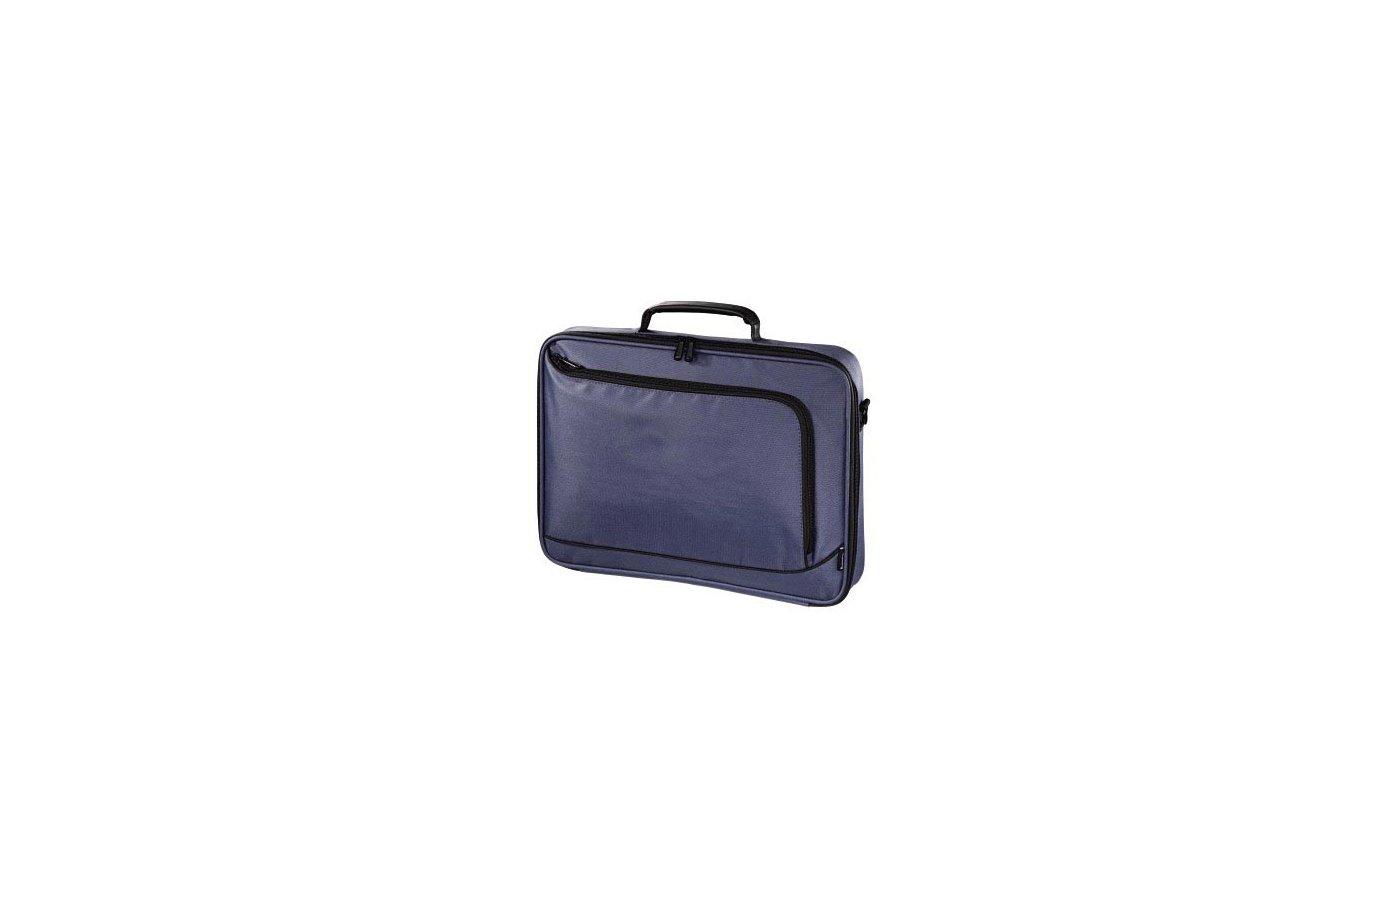 Кейс для ноутбука Hama для ноутбука 17.3 Sportsline Bordeaux Голубой Политекс (42.5x31x4.5см)